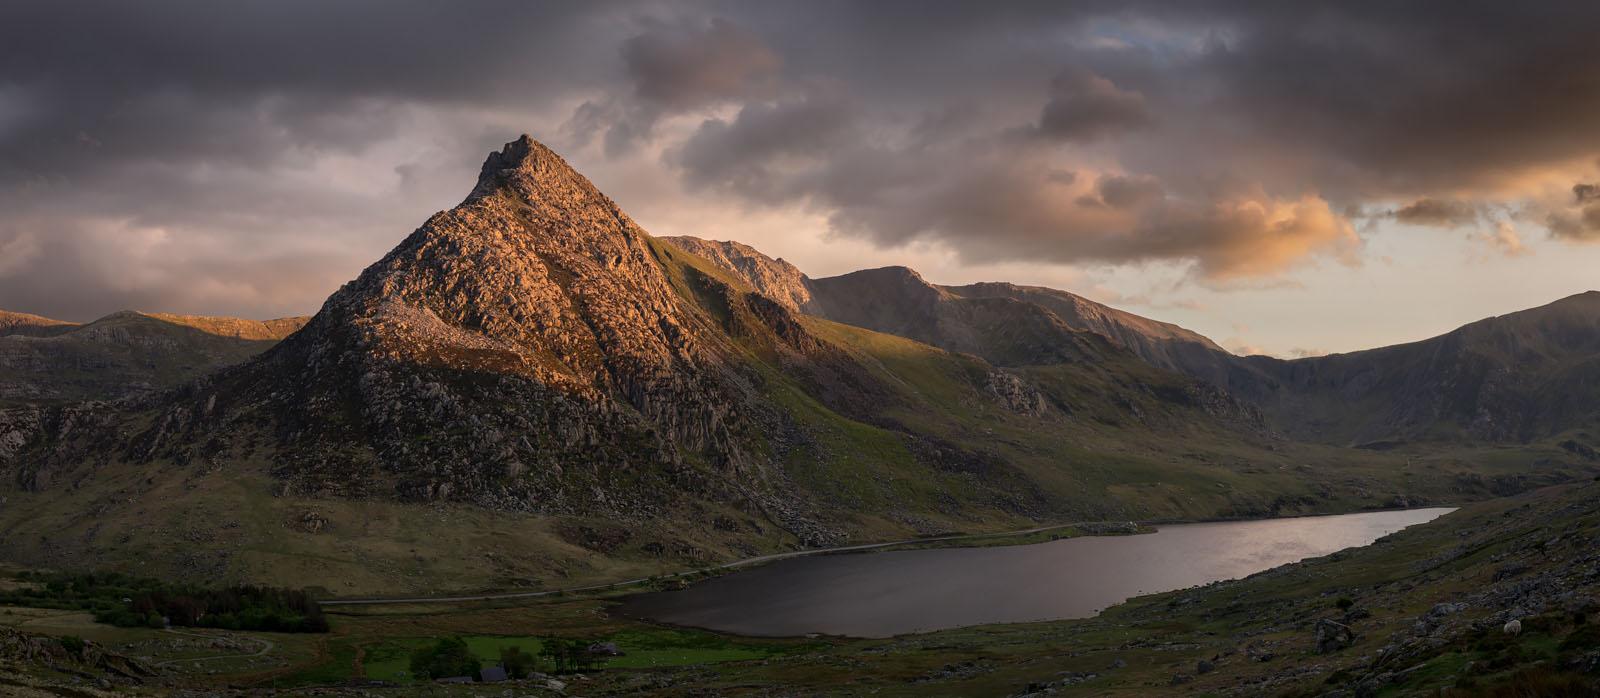 Tryfan Ogwen Valley Snowdonia Wales Landscape Photography